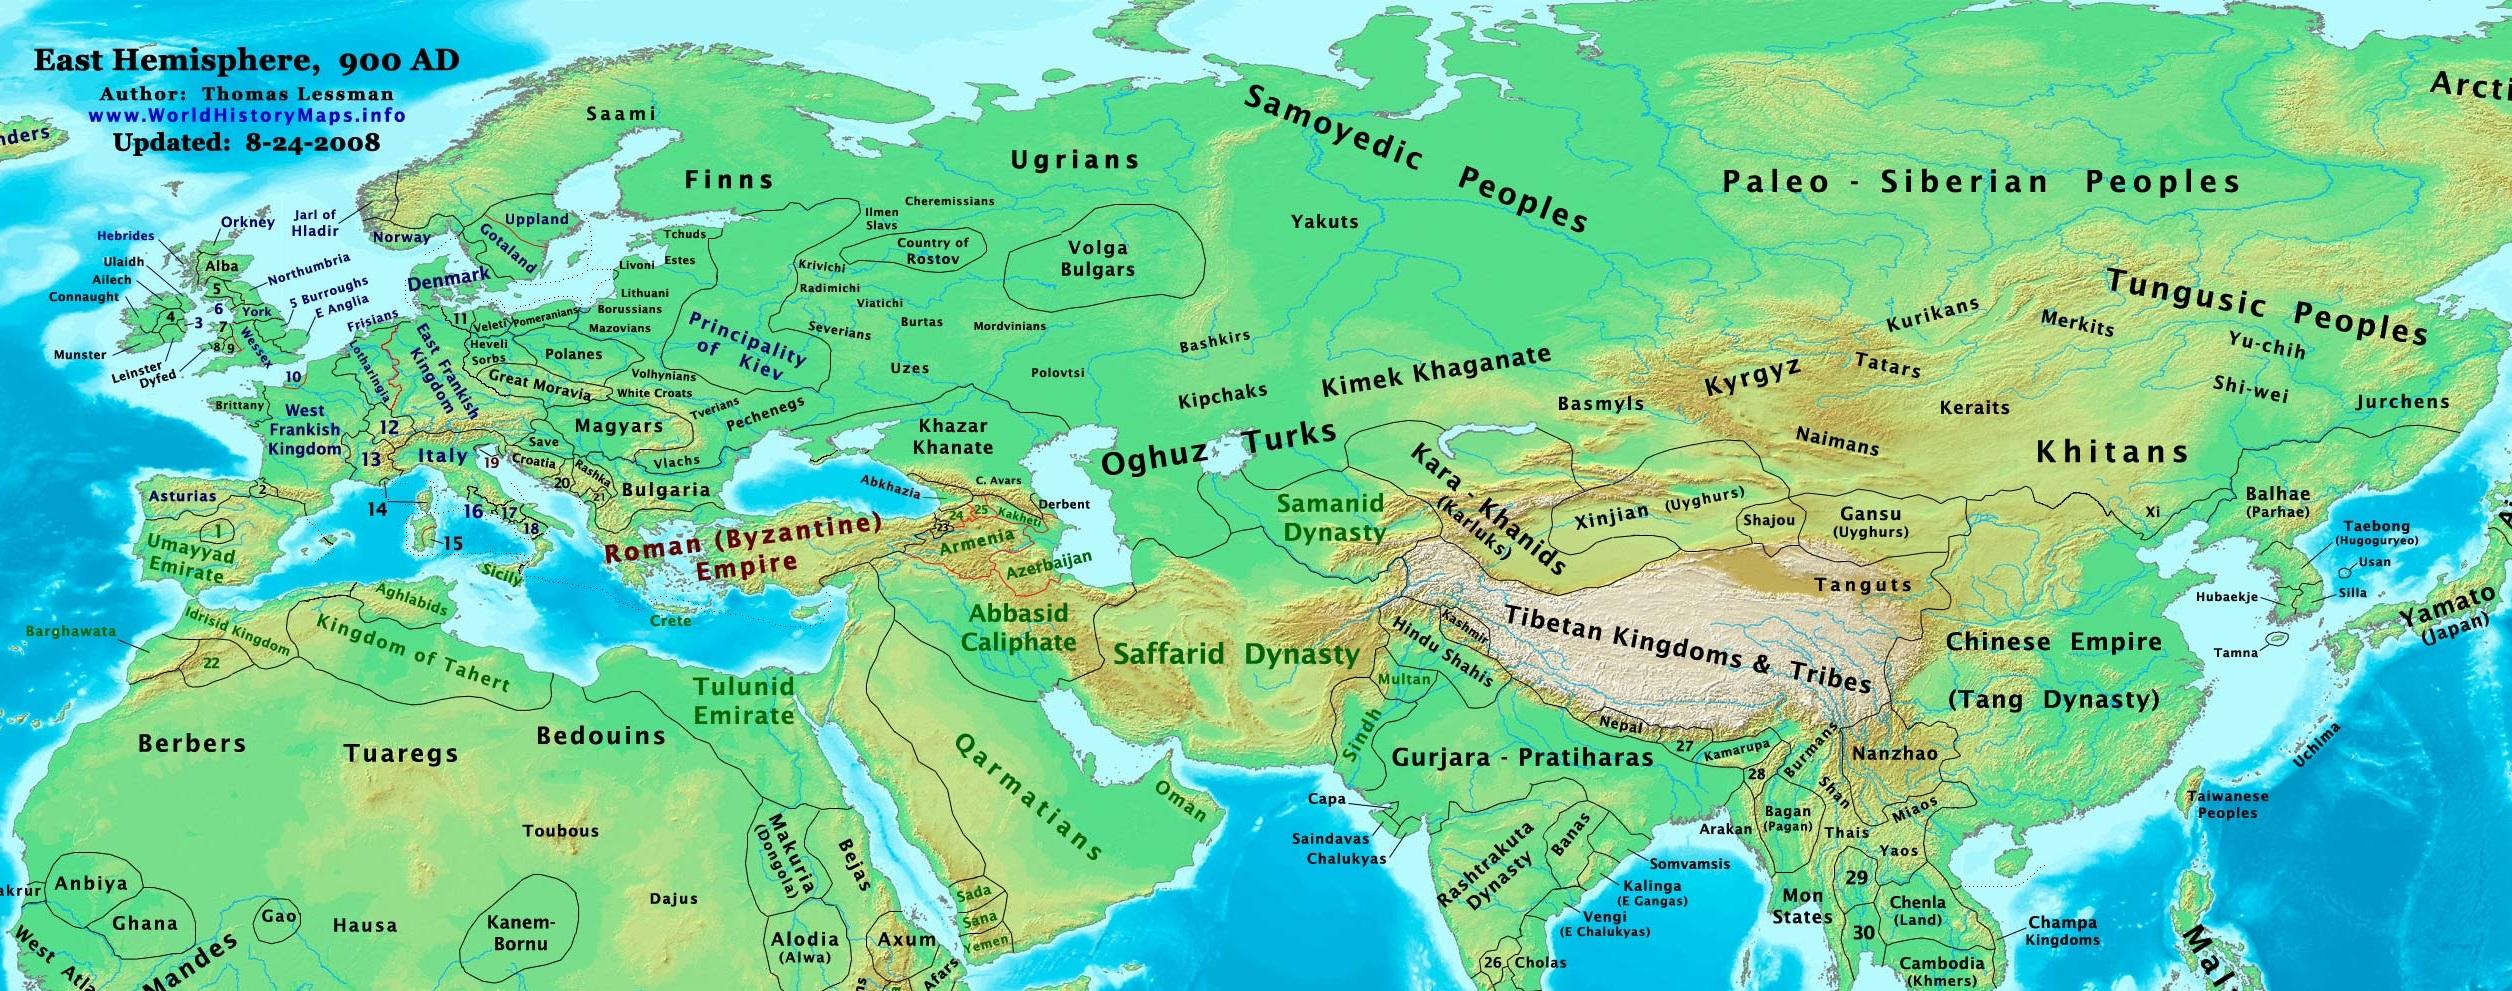 900 AD